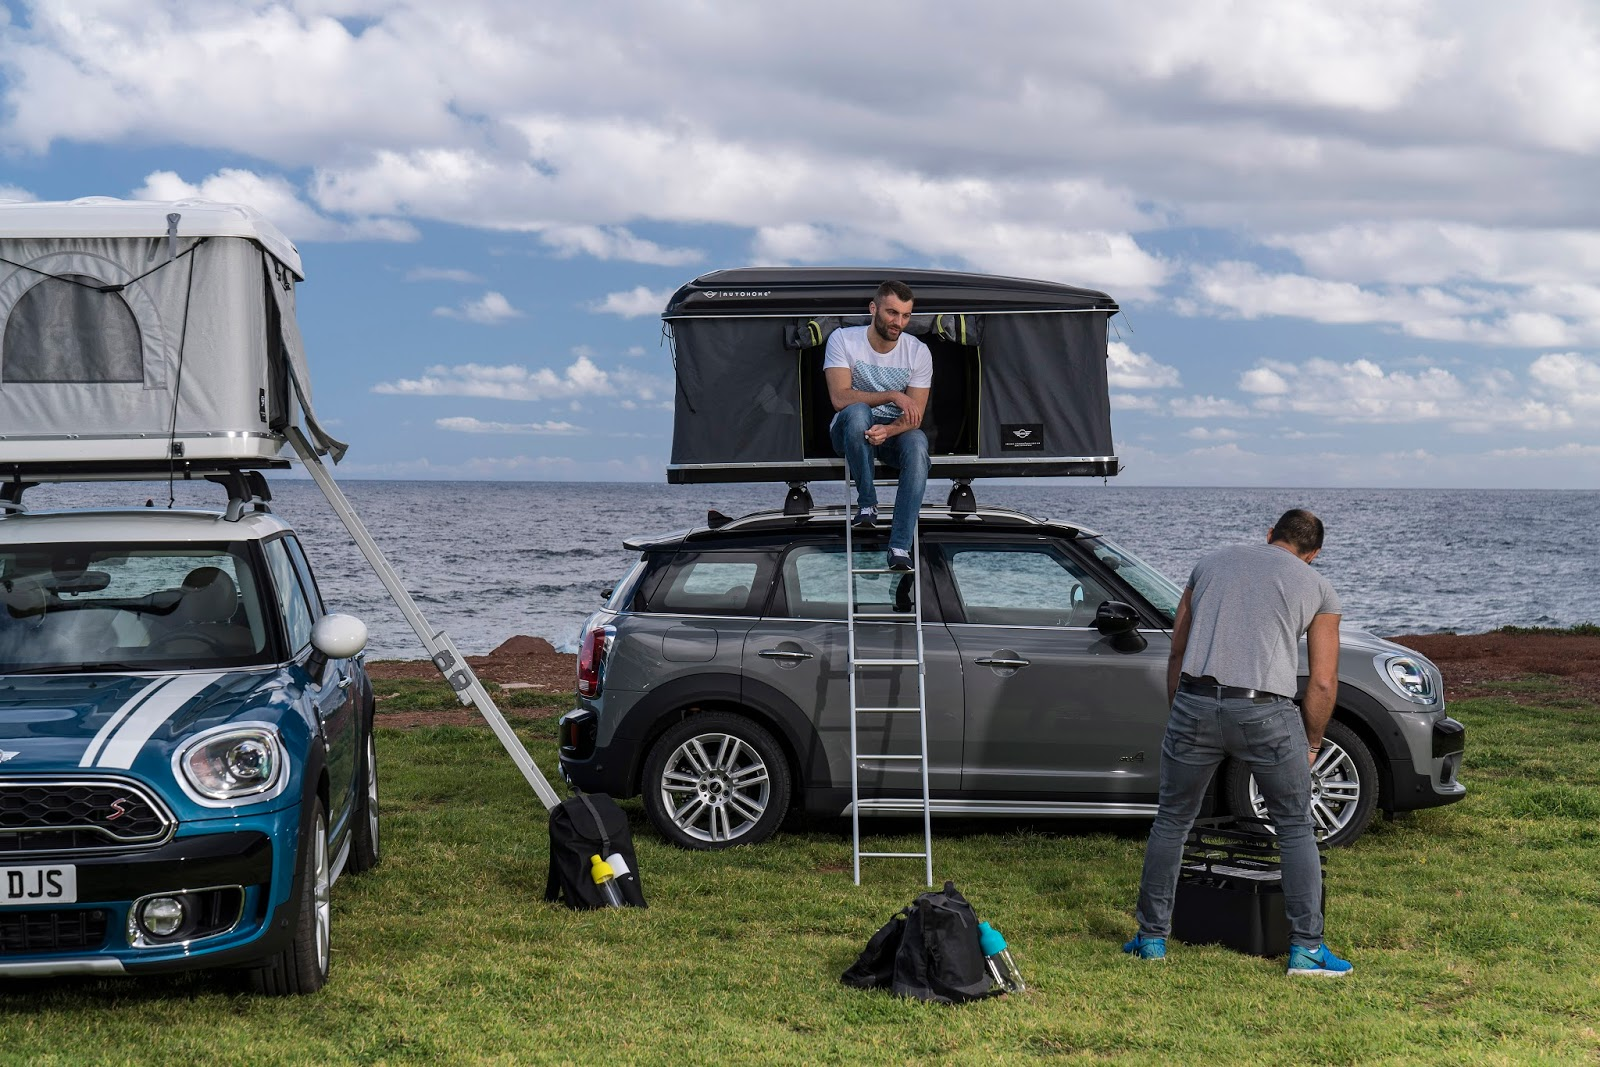 P90258005 highRes the autohome roof te Το MINI Countryman έχει και... σκηνή οροφής Mini, MINI Cooper Countryman, SUV